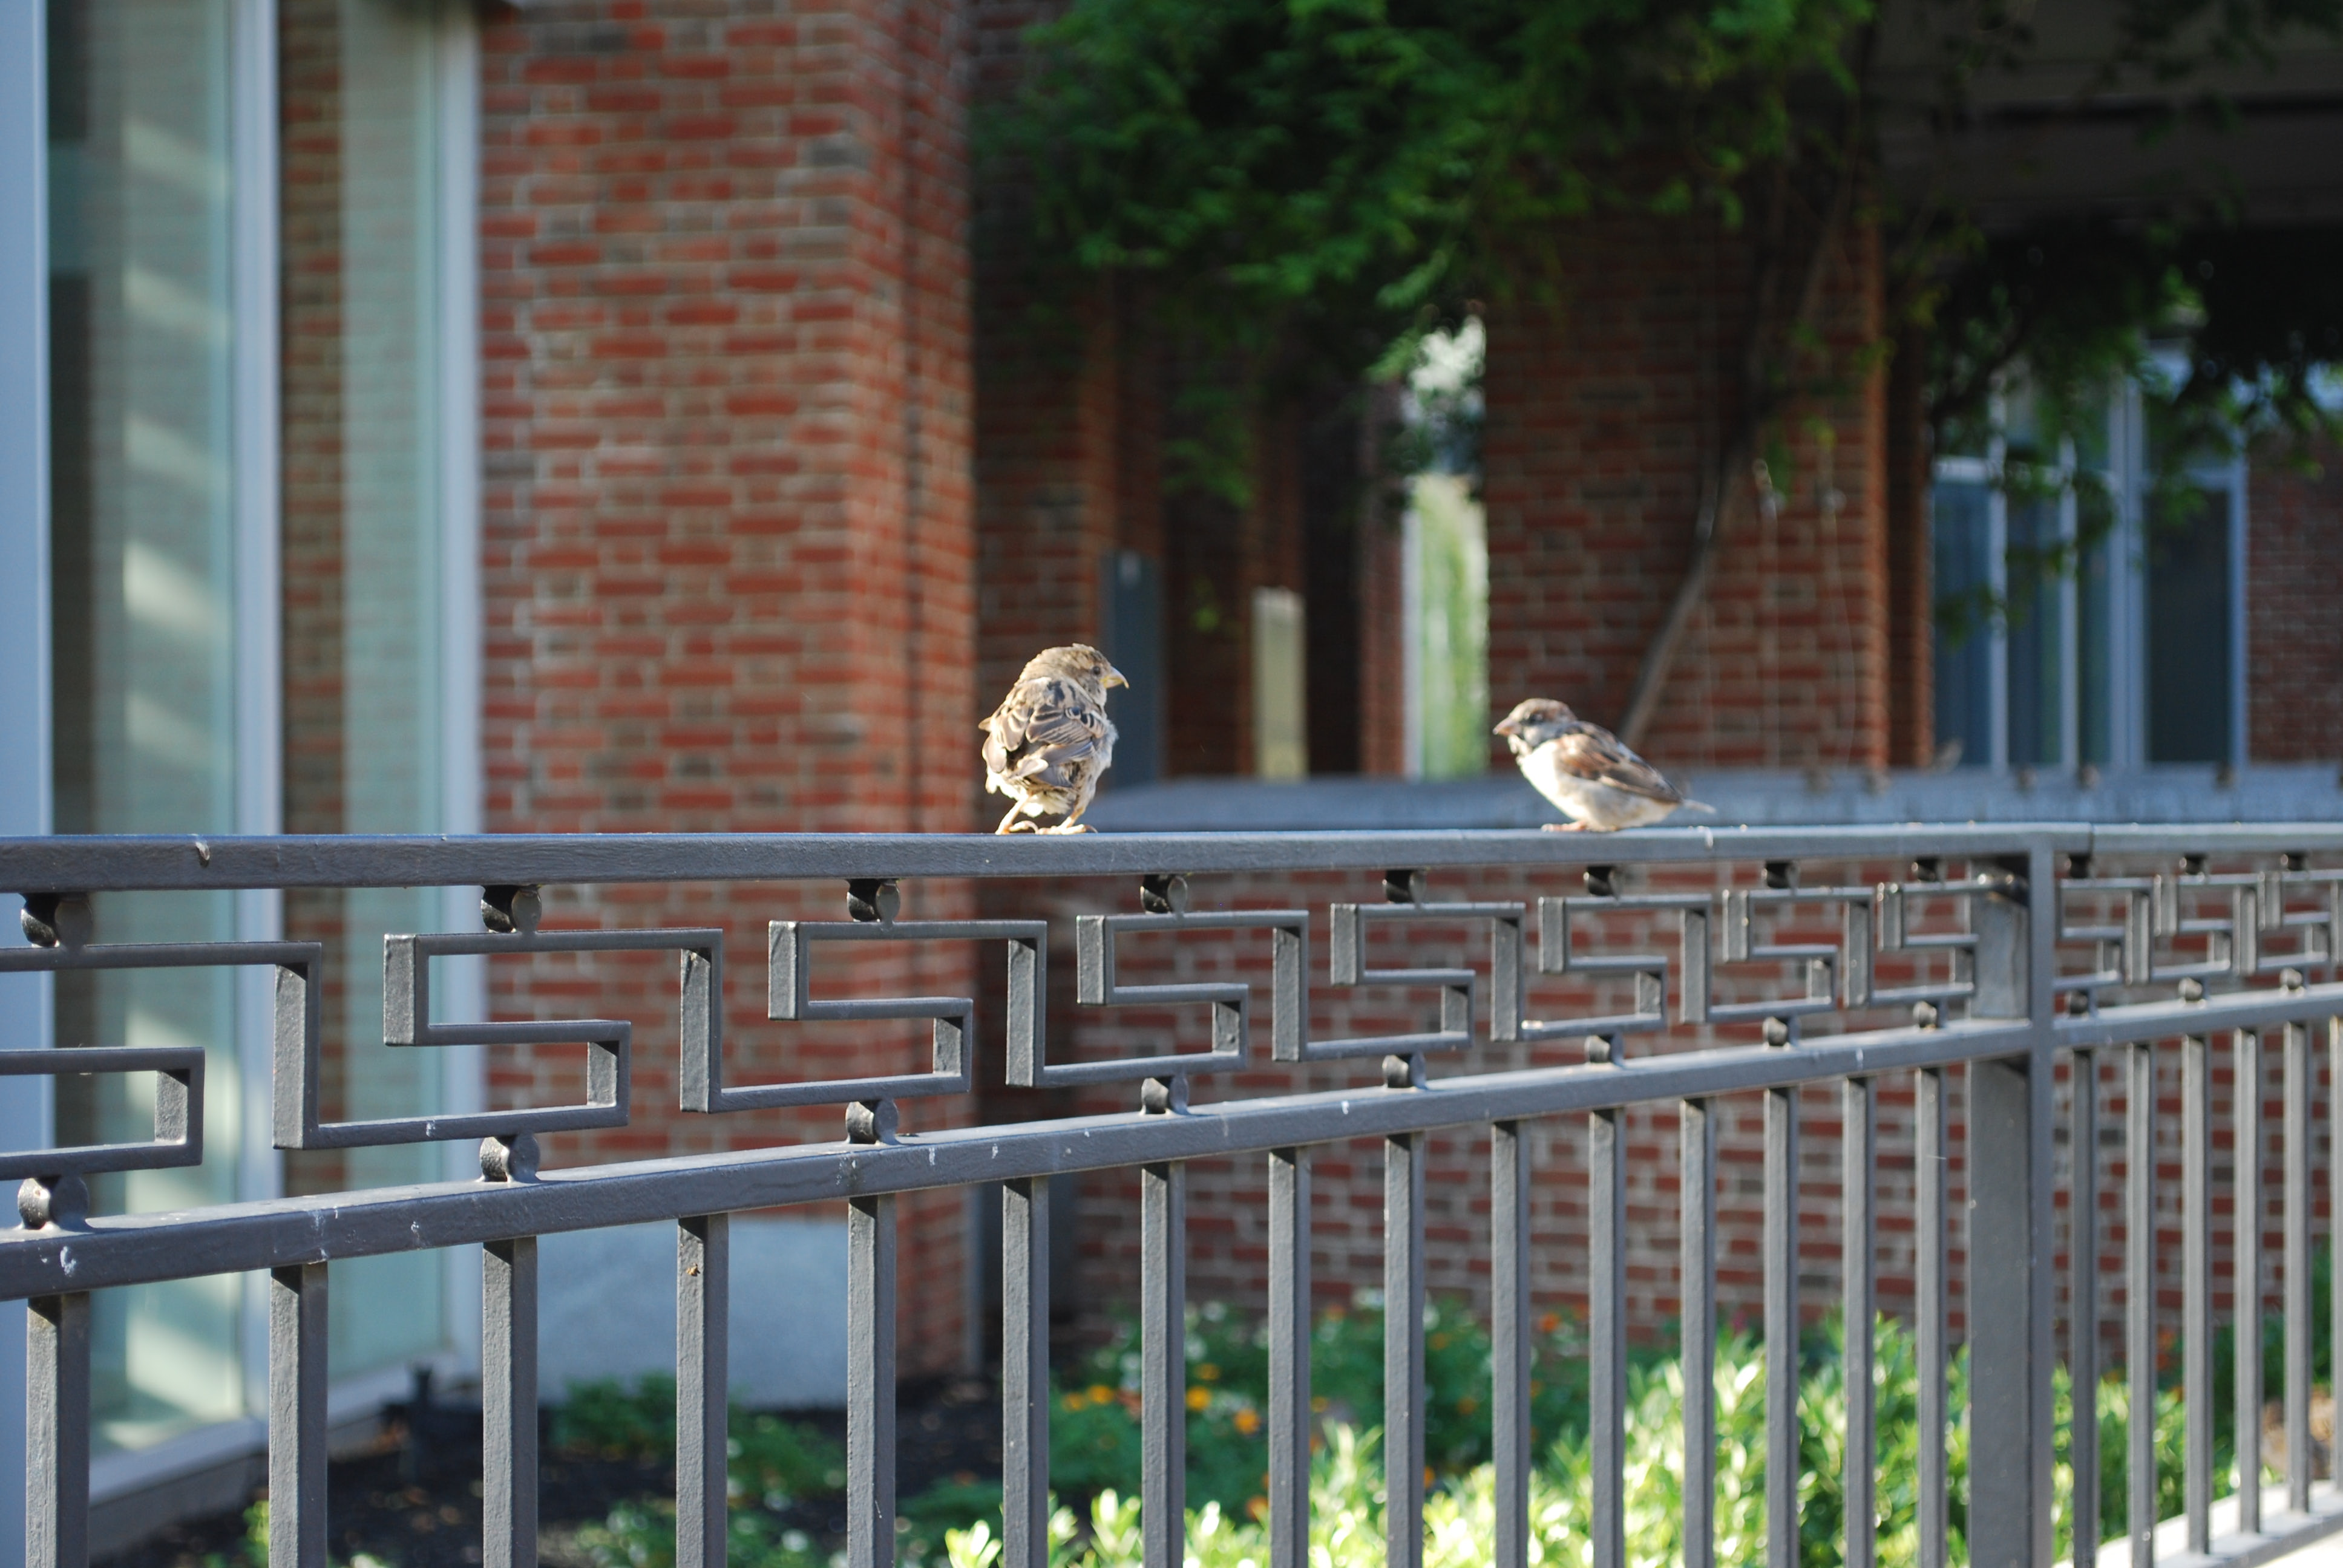 Birds perch on a rail near the Liberty Bell